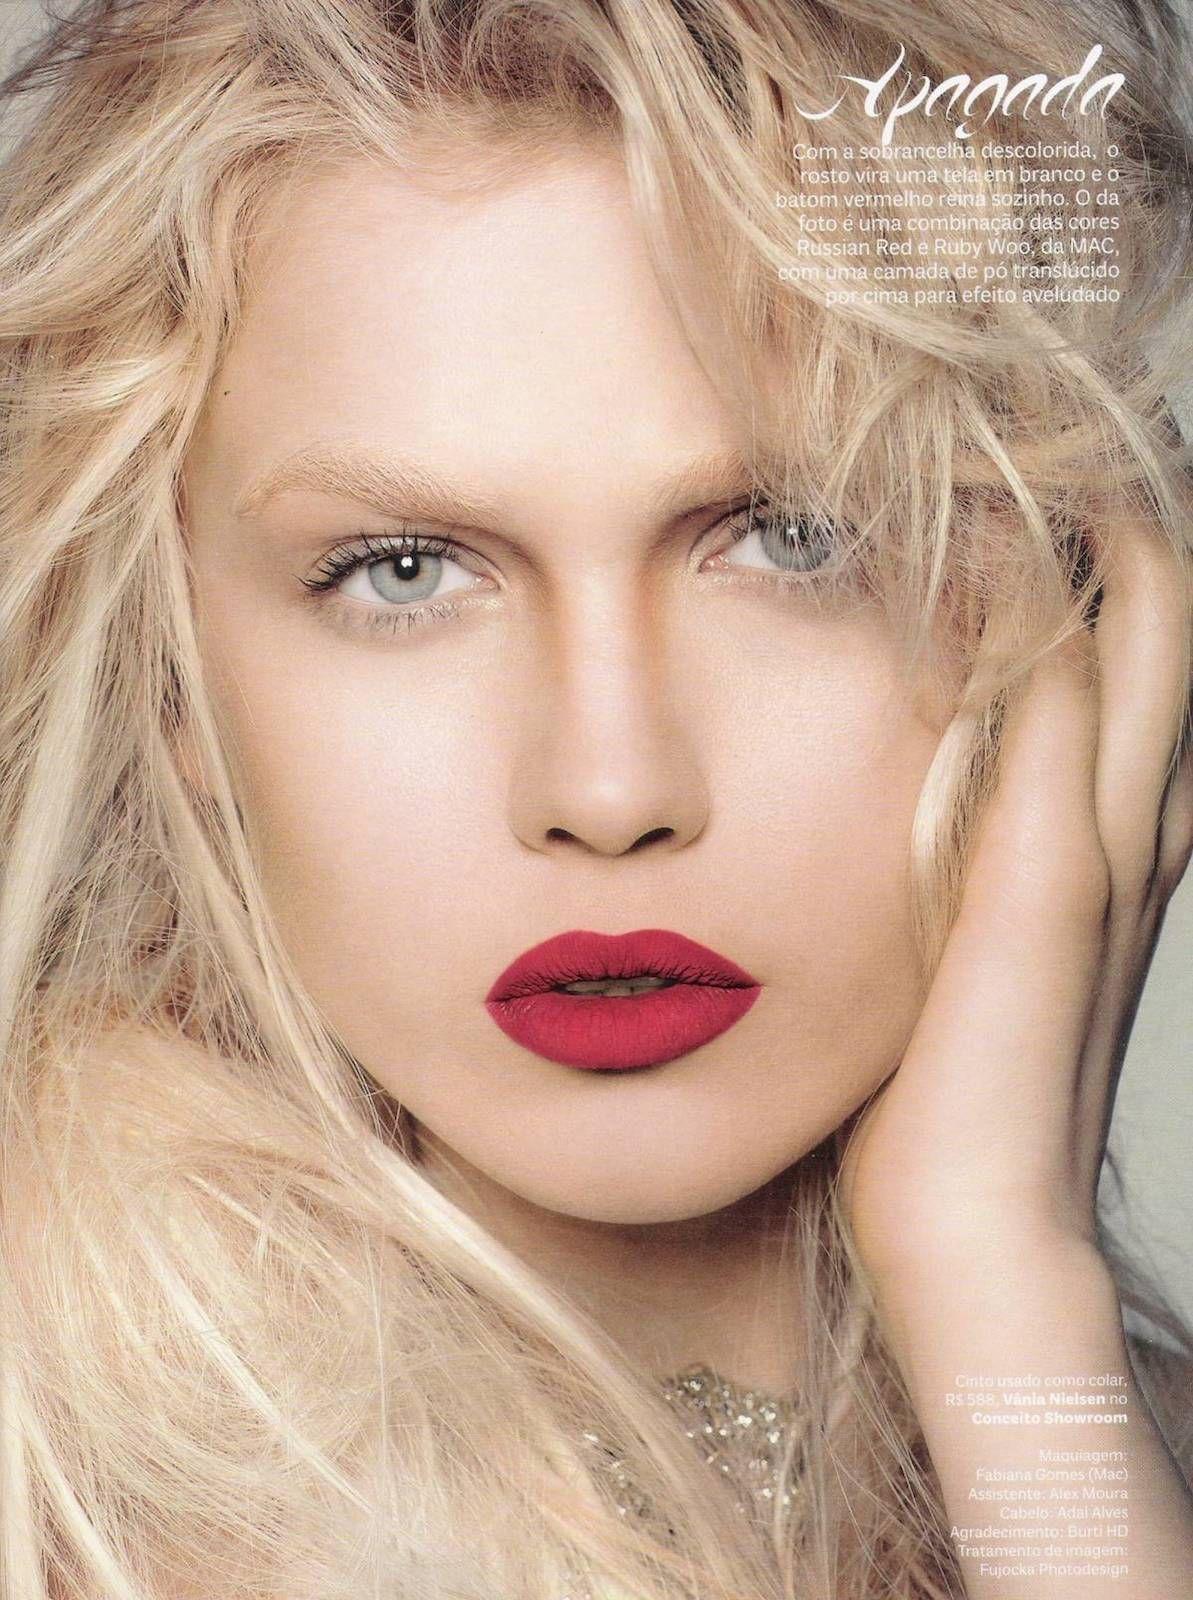 Anastasia Bondarenko Vogue brazil, Brazil beauty, Anastasia